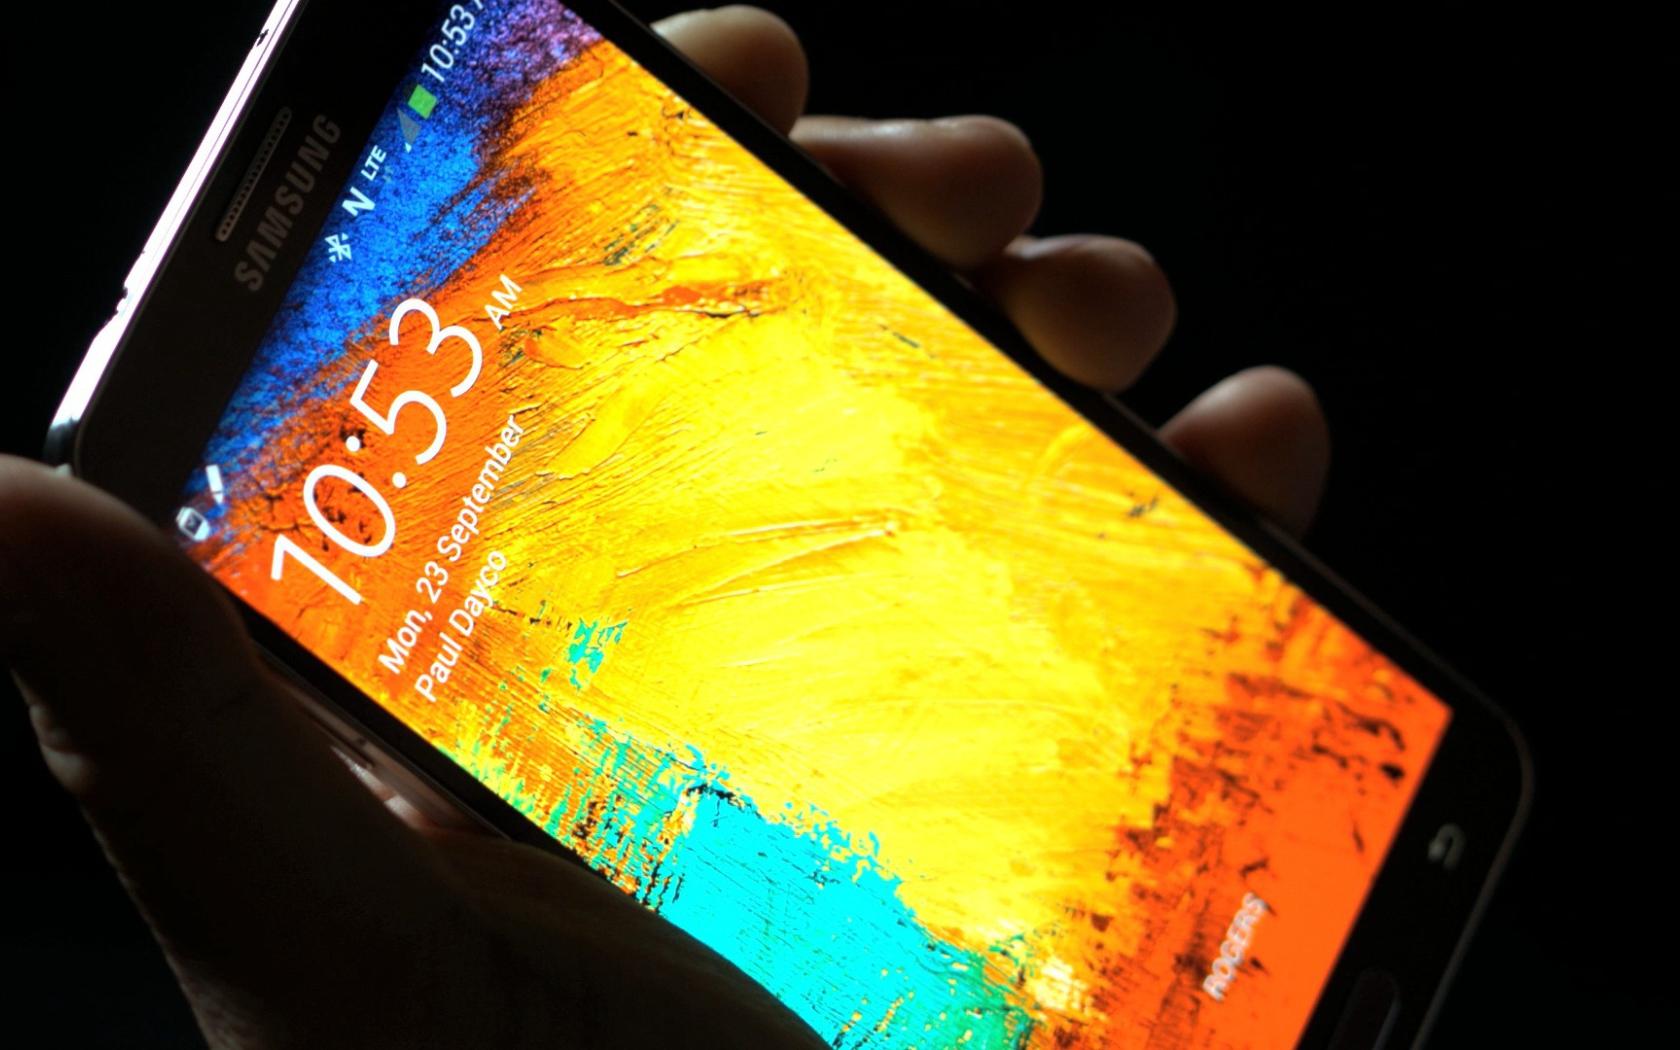 Screen Samsung Galaxy Note 3 Desktop Wallpapers 1680x1050